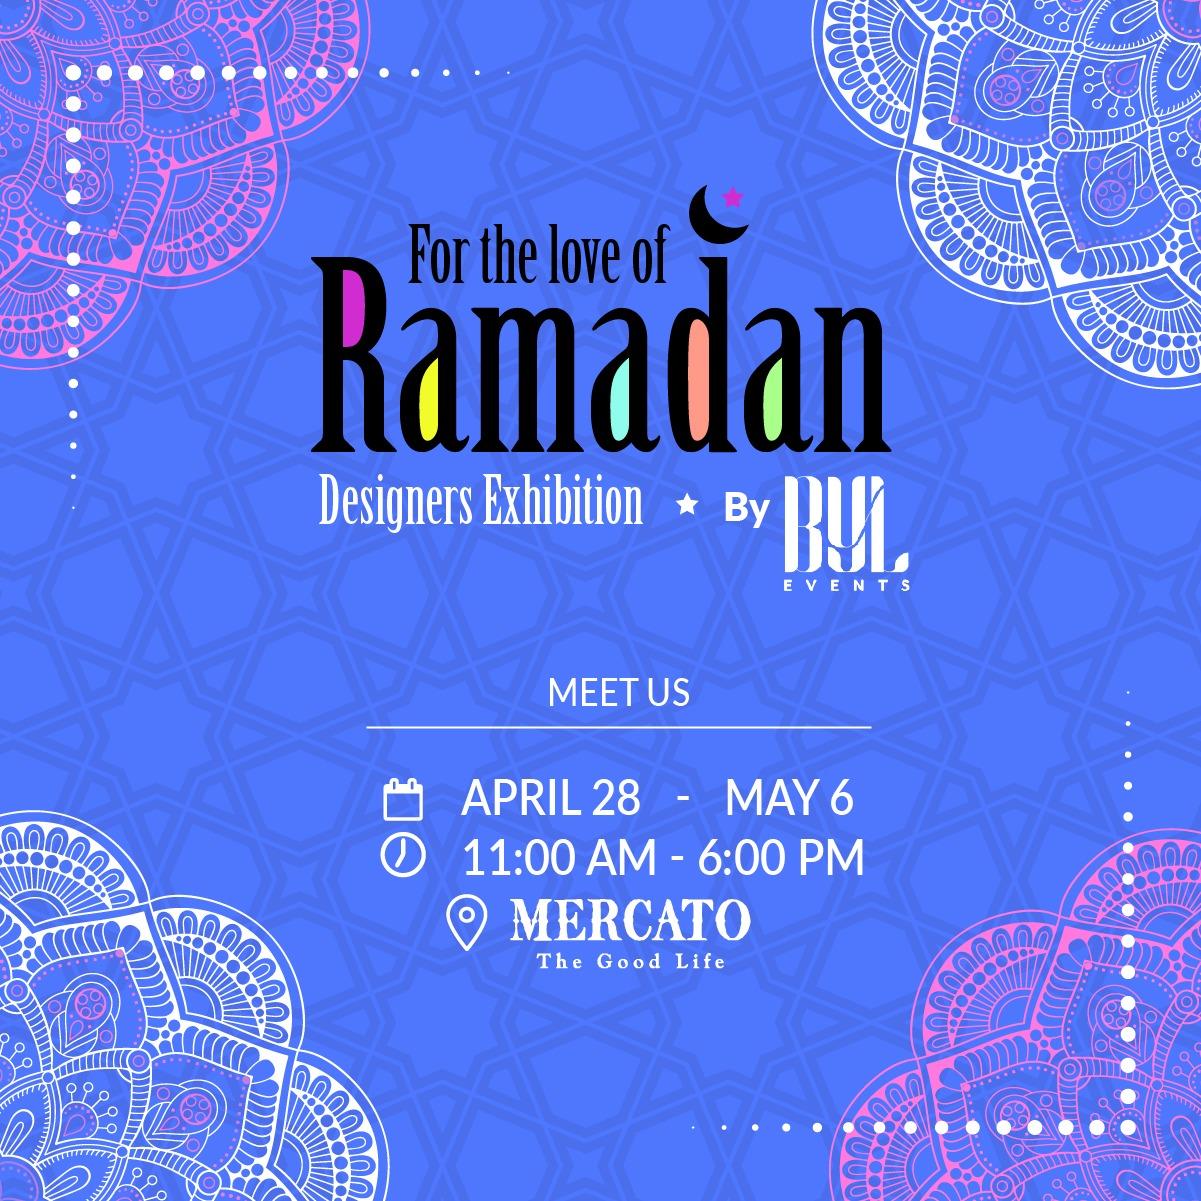 """For the Love of Ramadan"" معرض يجمع مصممين من العالم العربي ويتيح فرصة التسّوق للزائرين ضمن أجواء رمضانية مميزة في مركاتو مول دبي!"